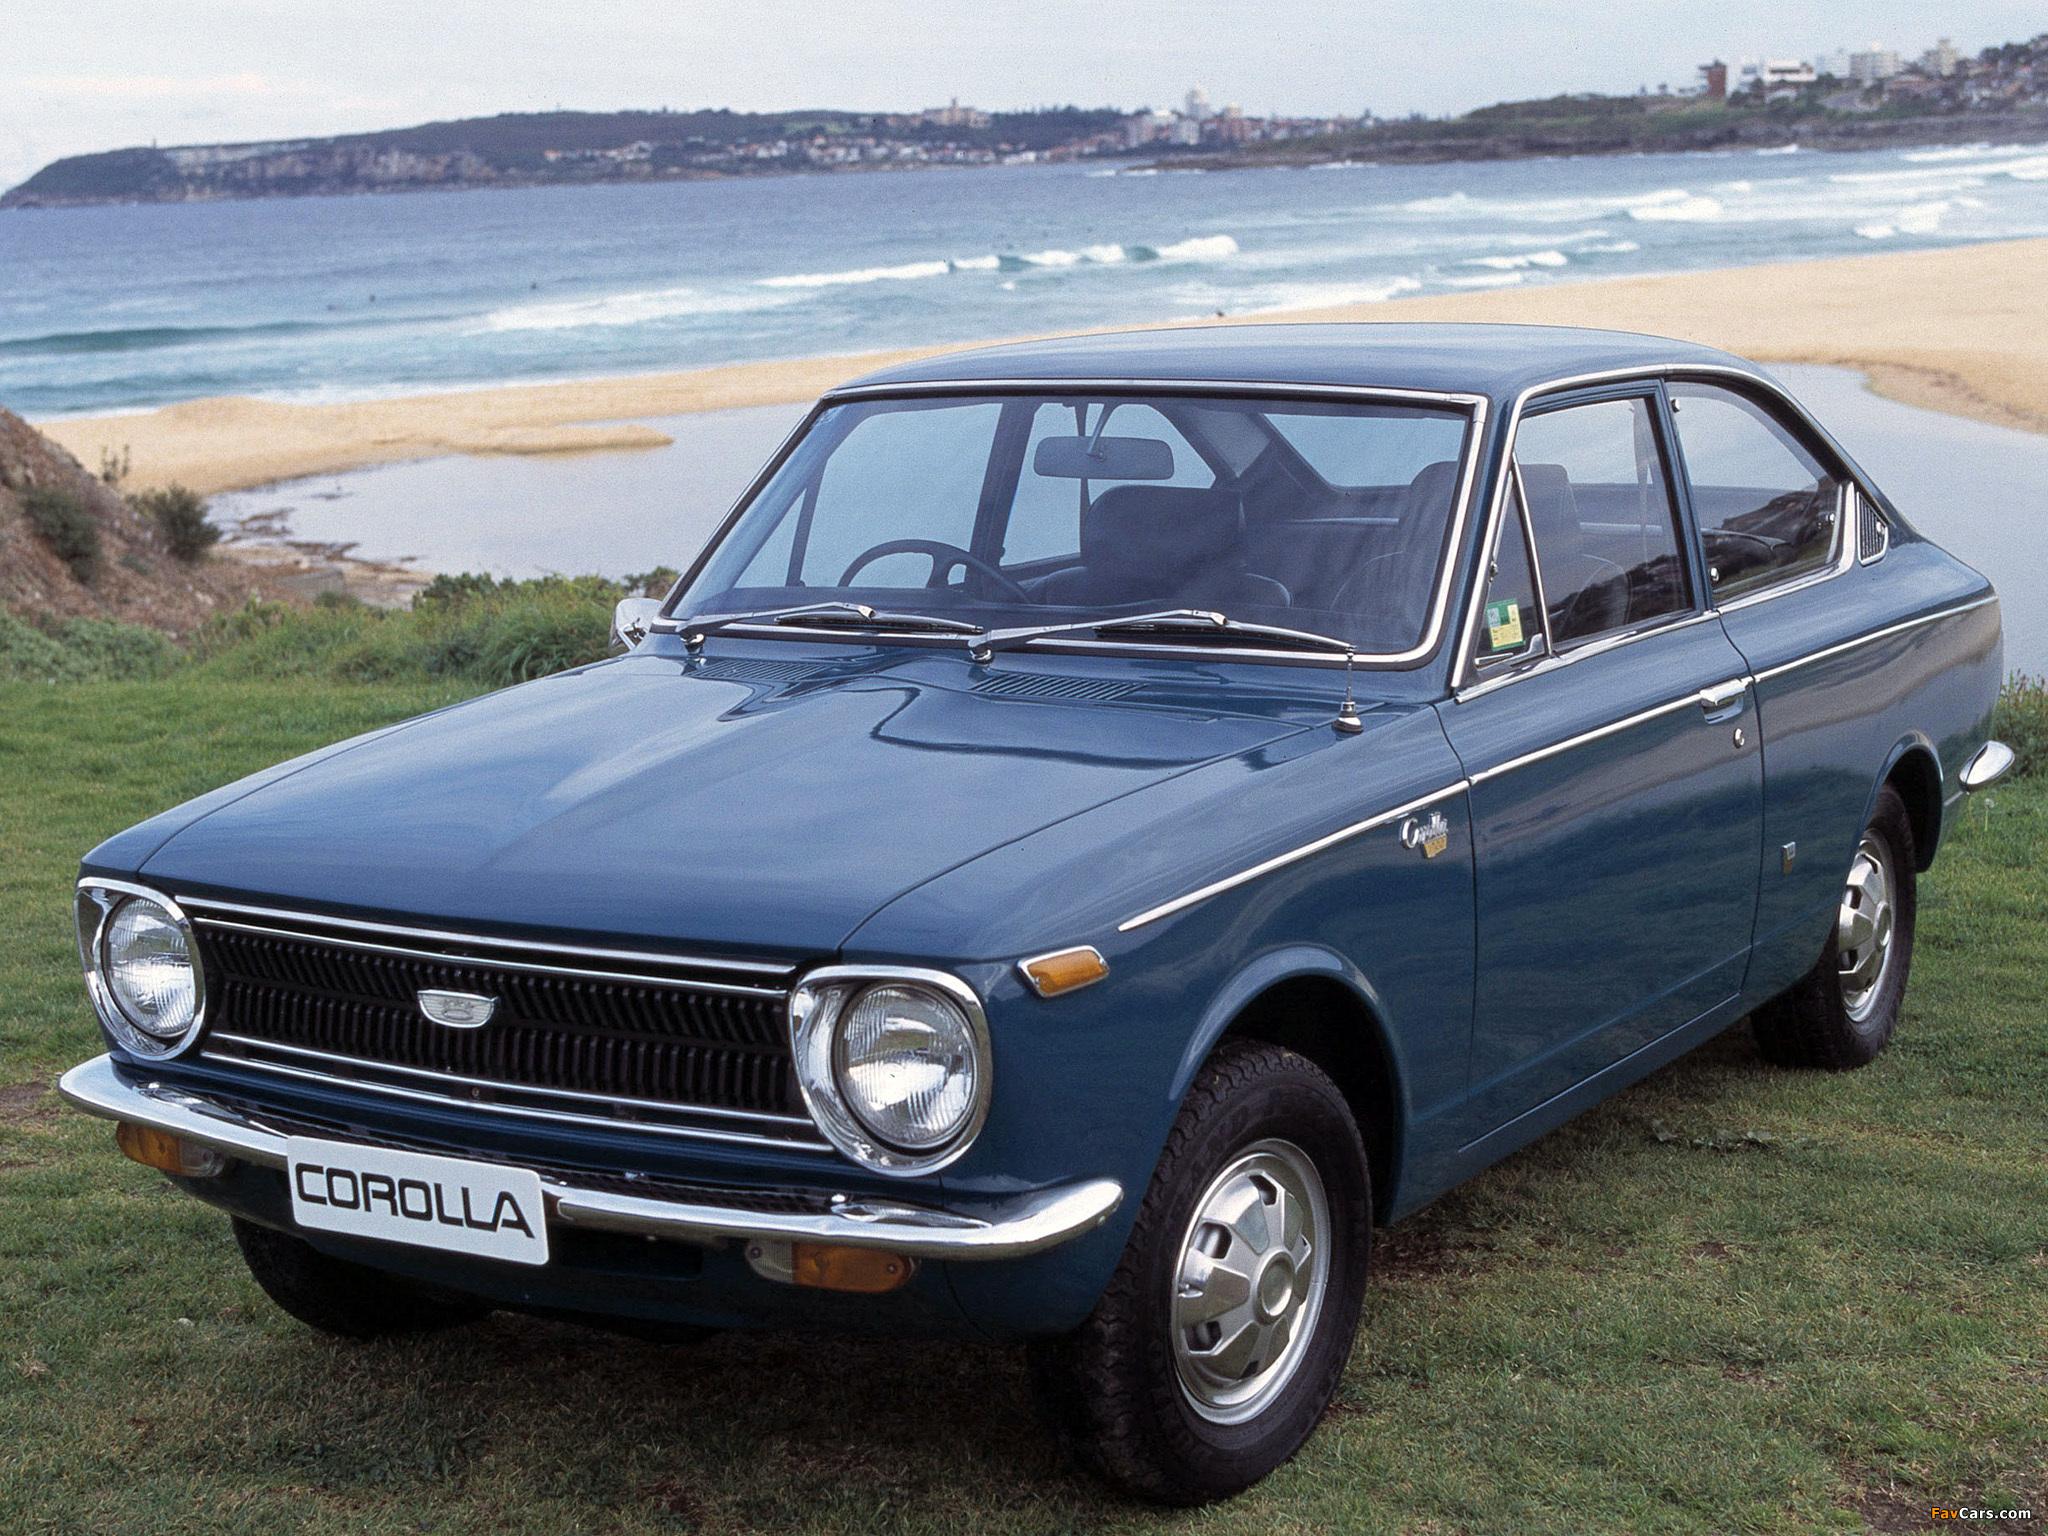 Toyota Corolla Au Spec E10 11 1966 70 Photos 2048x1536